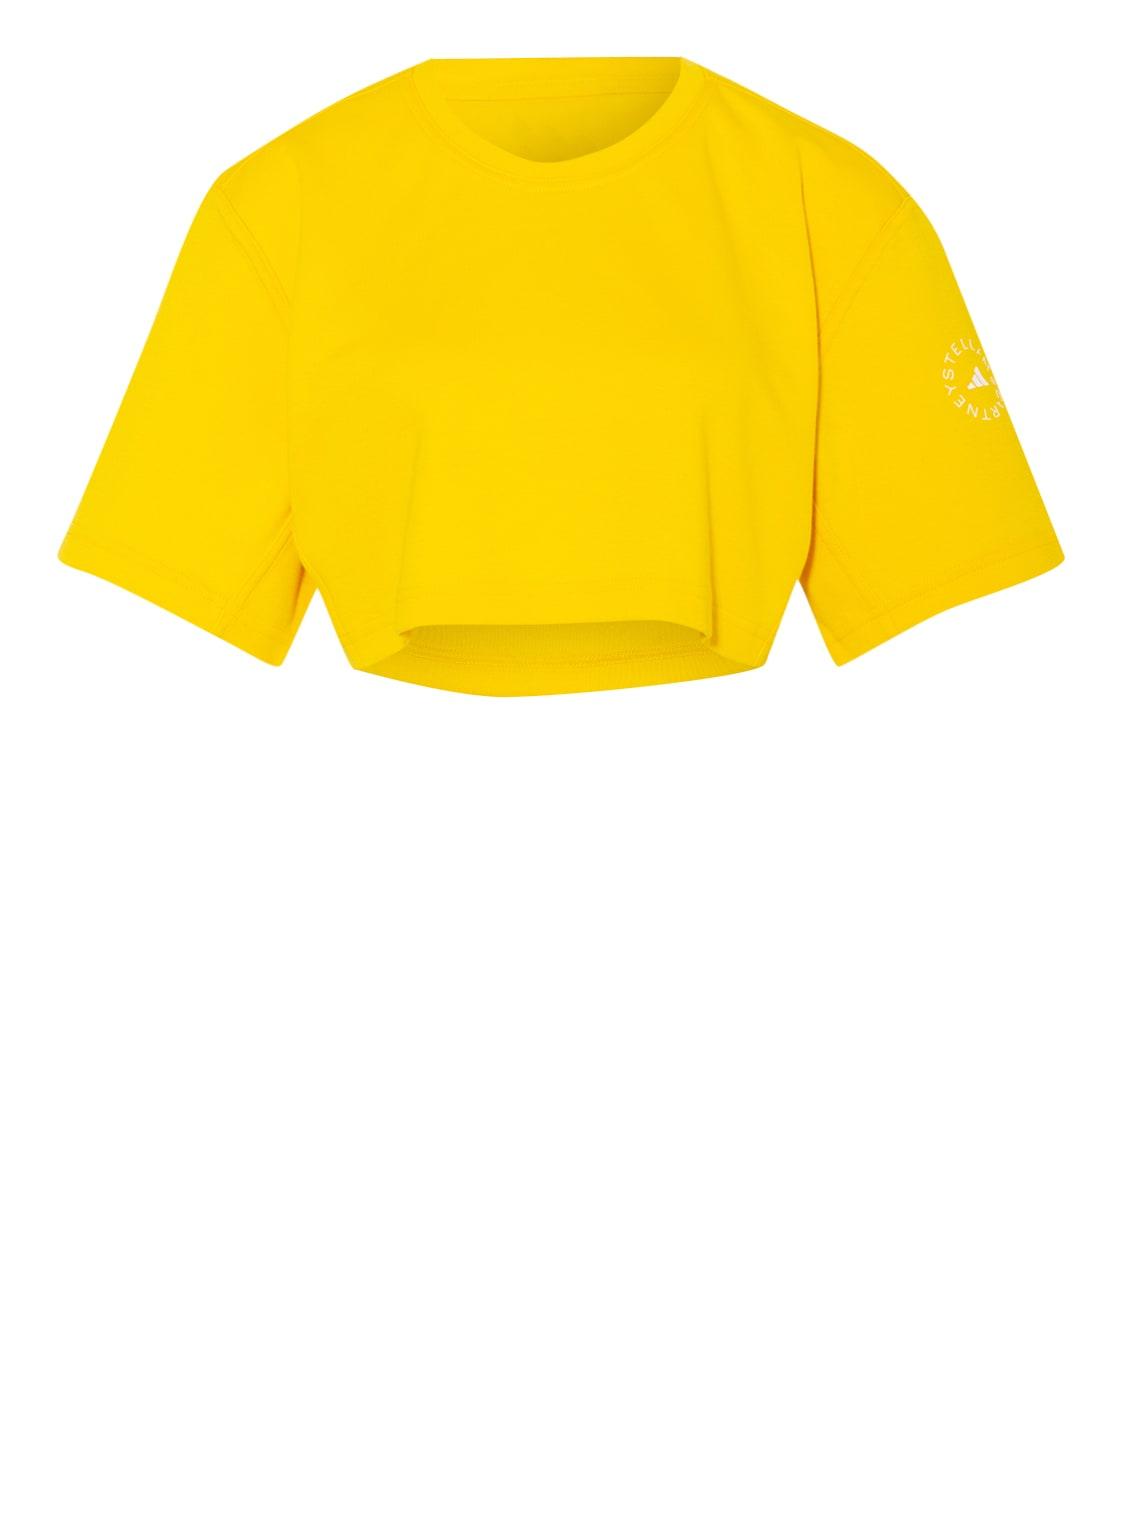 Image of Adidas By Stella Mccartney Cropped-Shirt Future Playground gelb